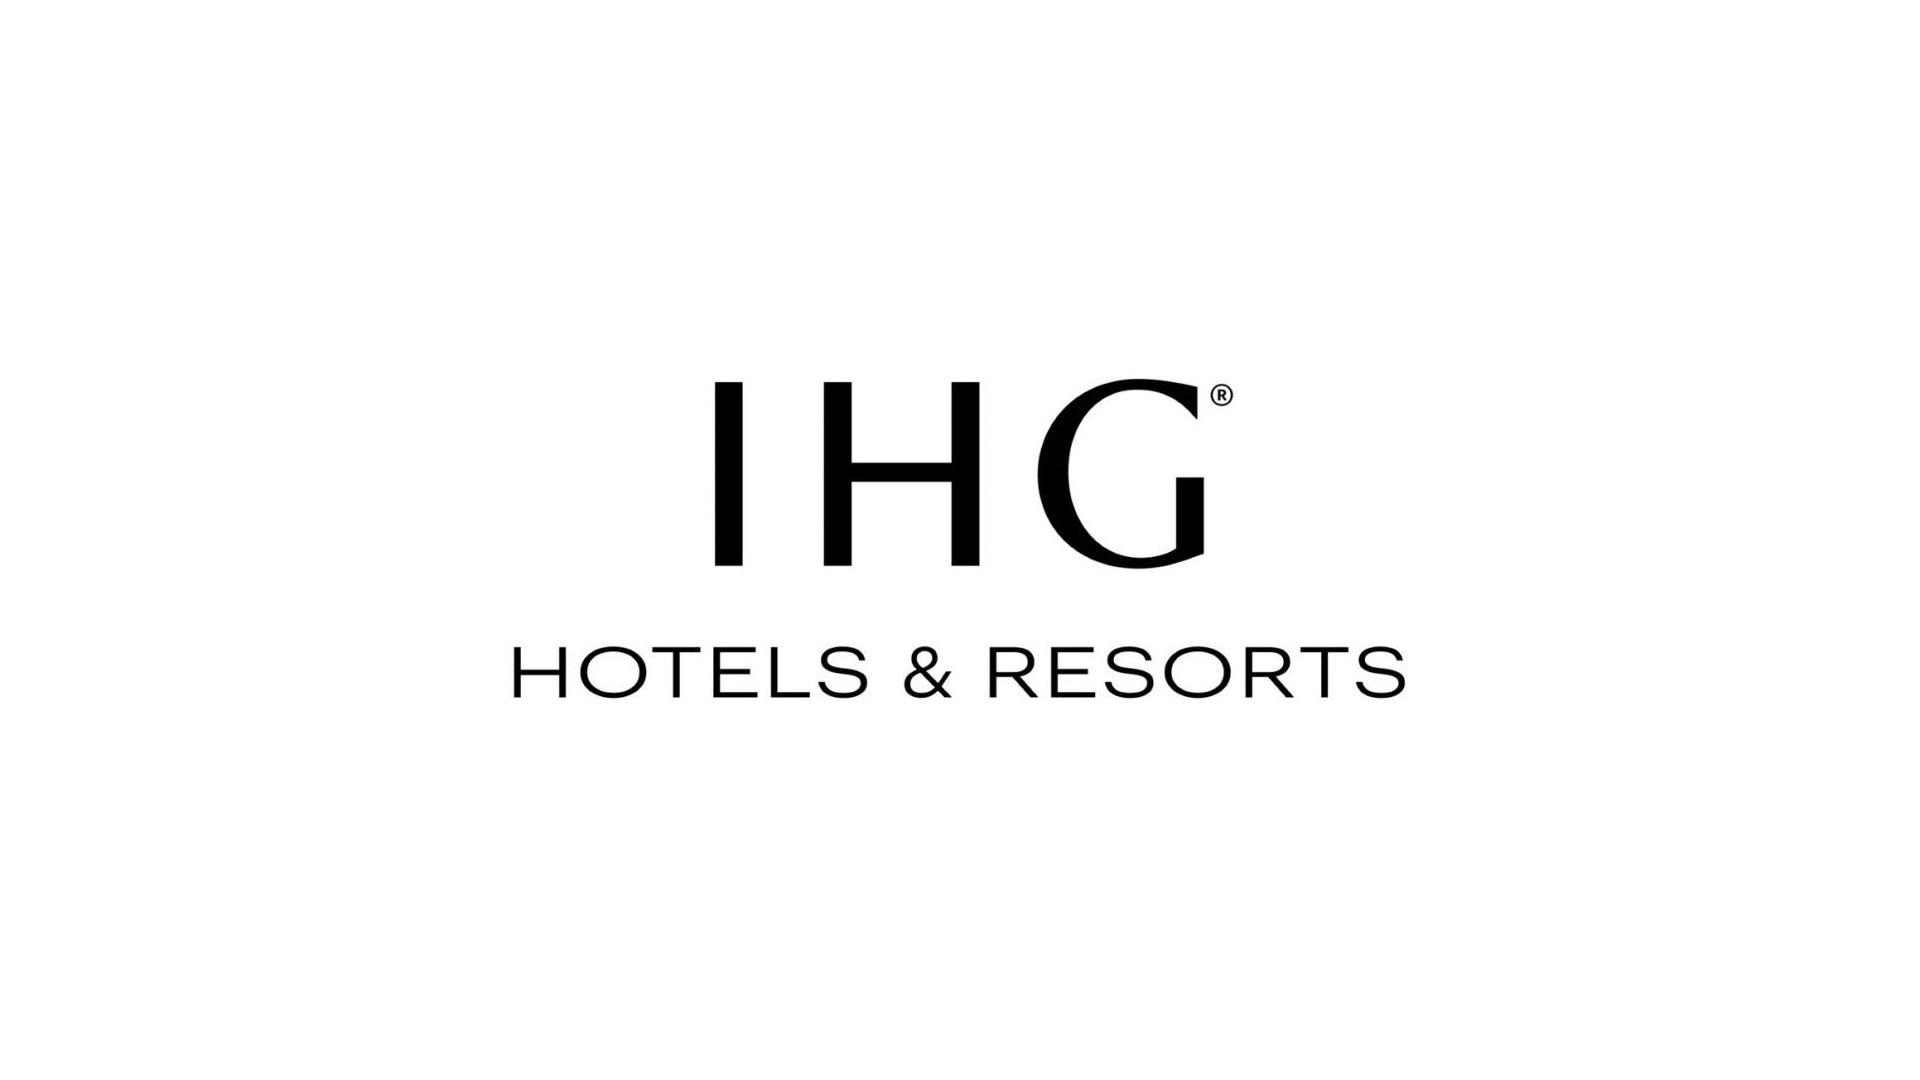 IHG Hotels&Resorts